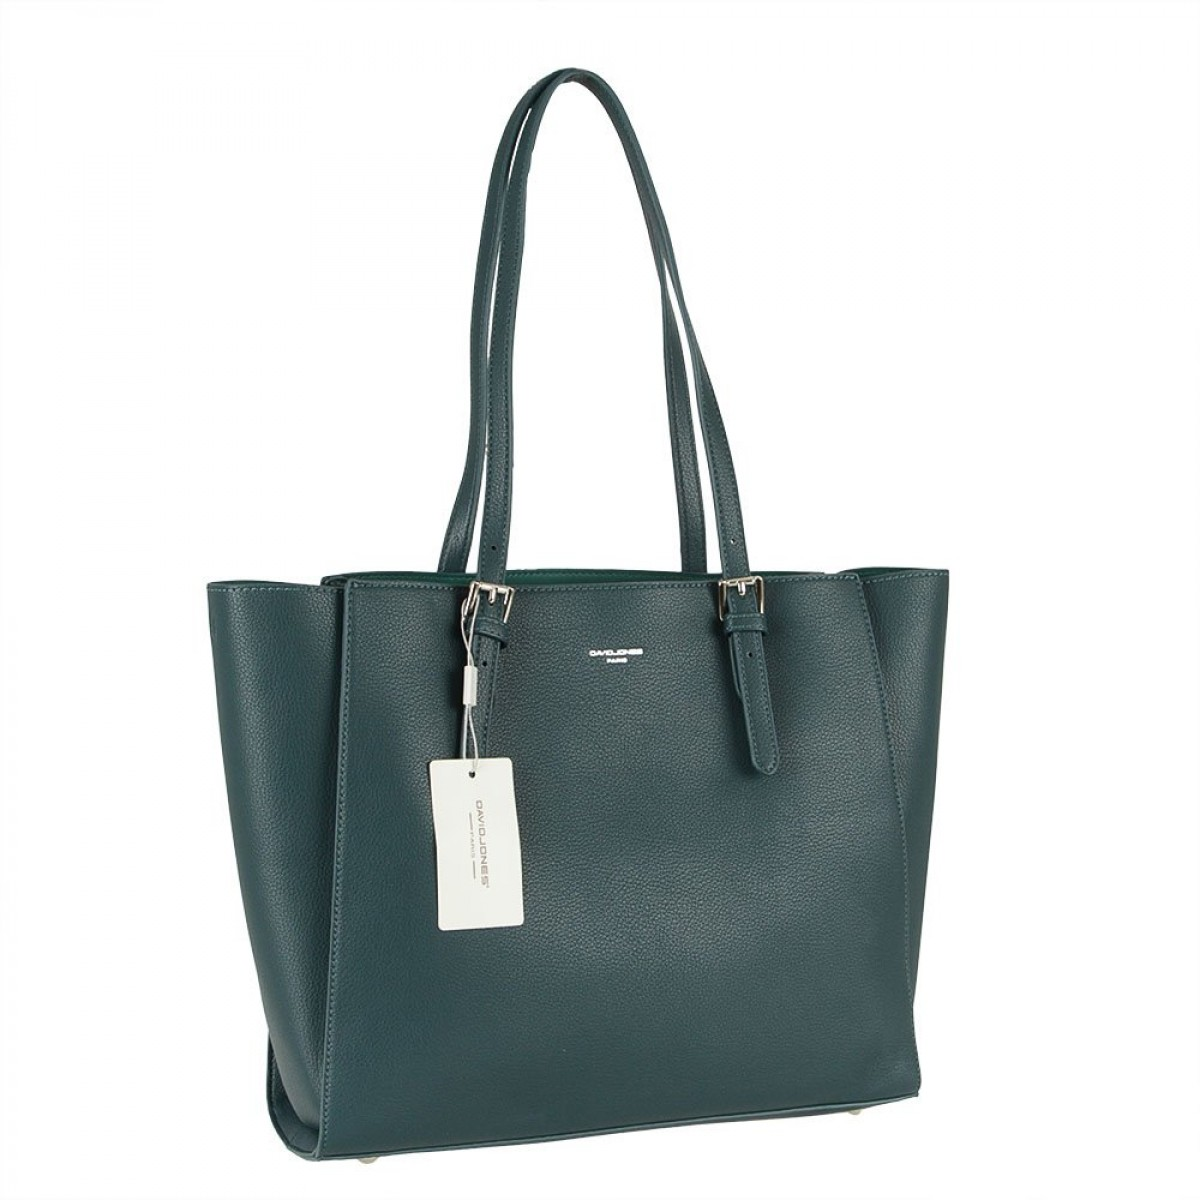 Жіноча сумка David Jones CM5872 PEACOCK BLUE